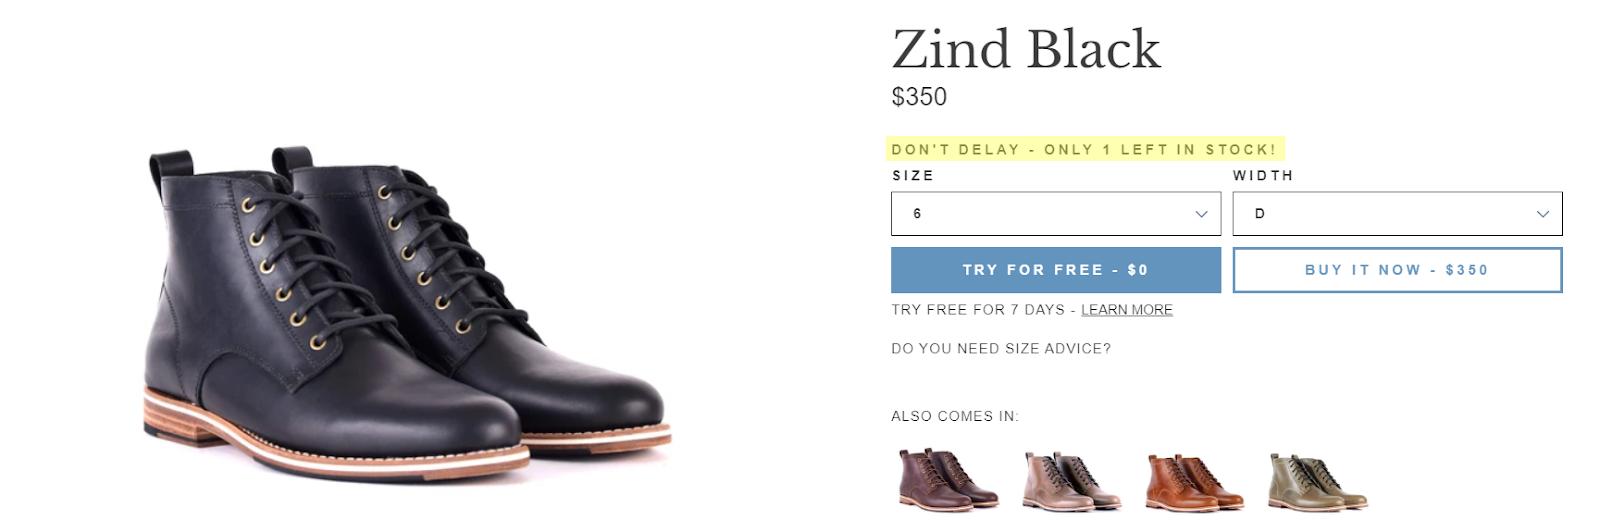 Helm Boots - Zind Black